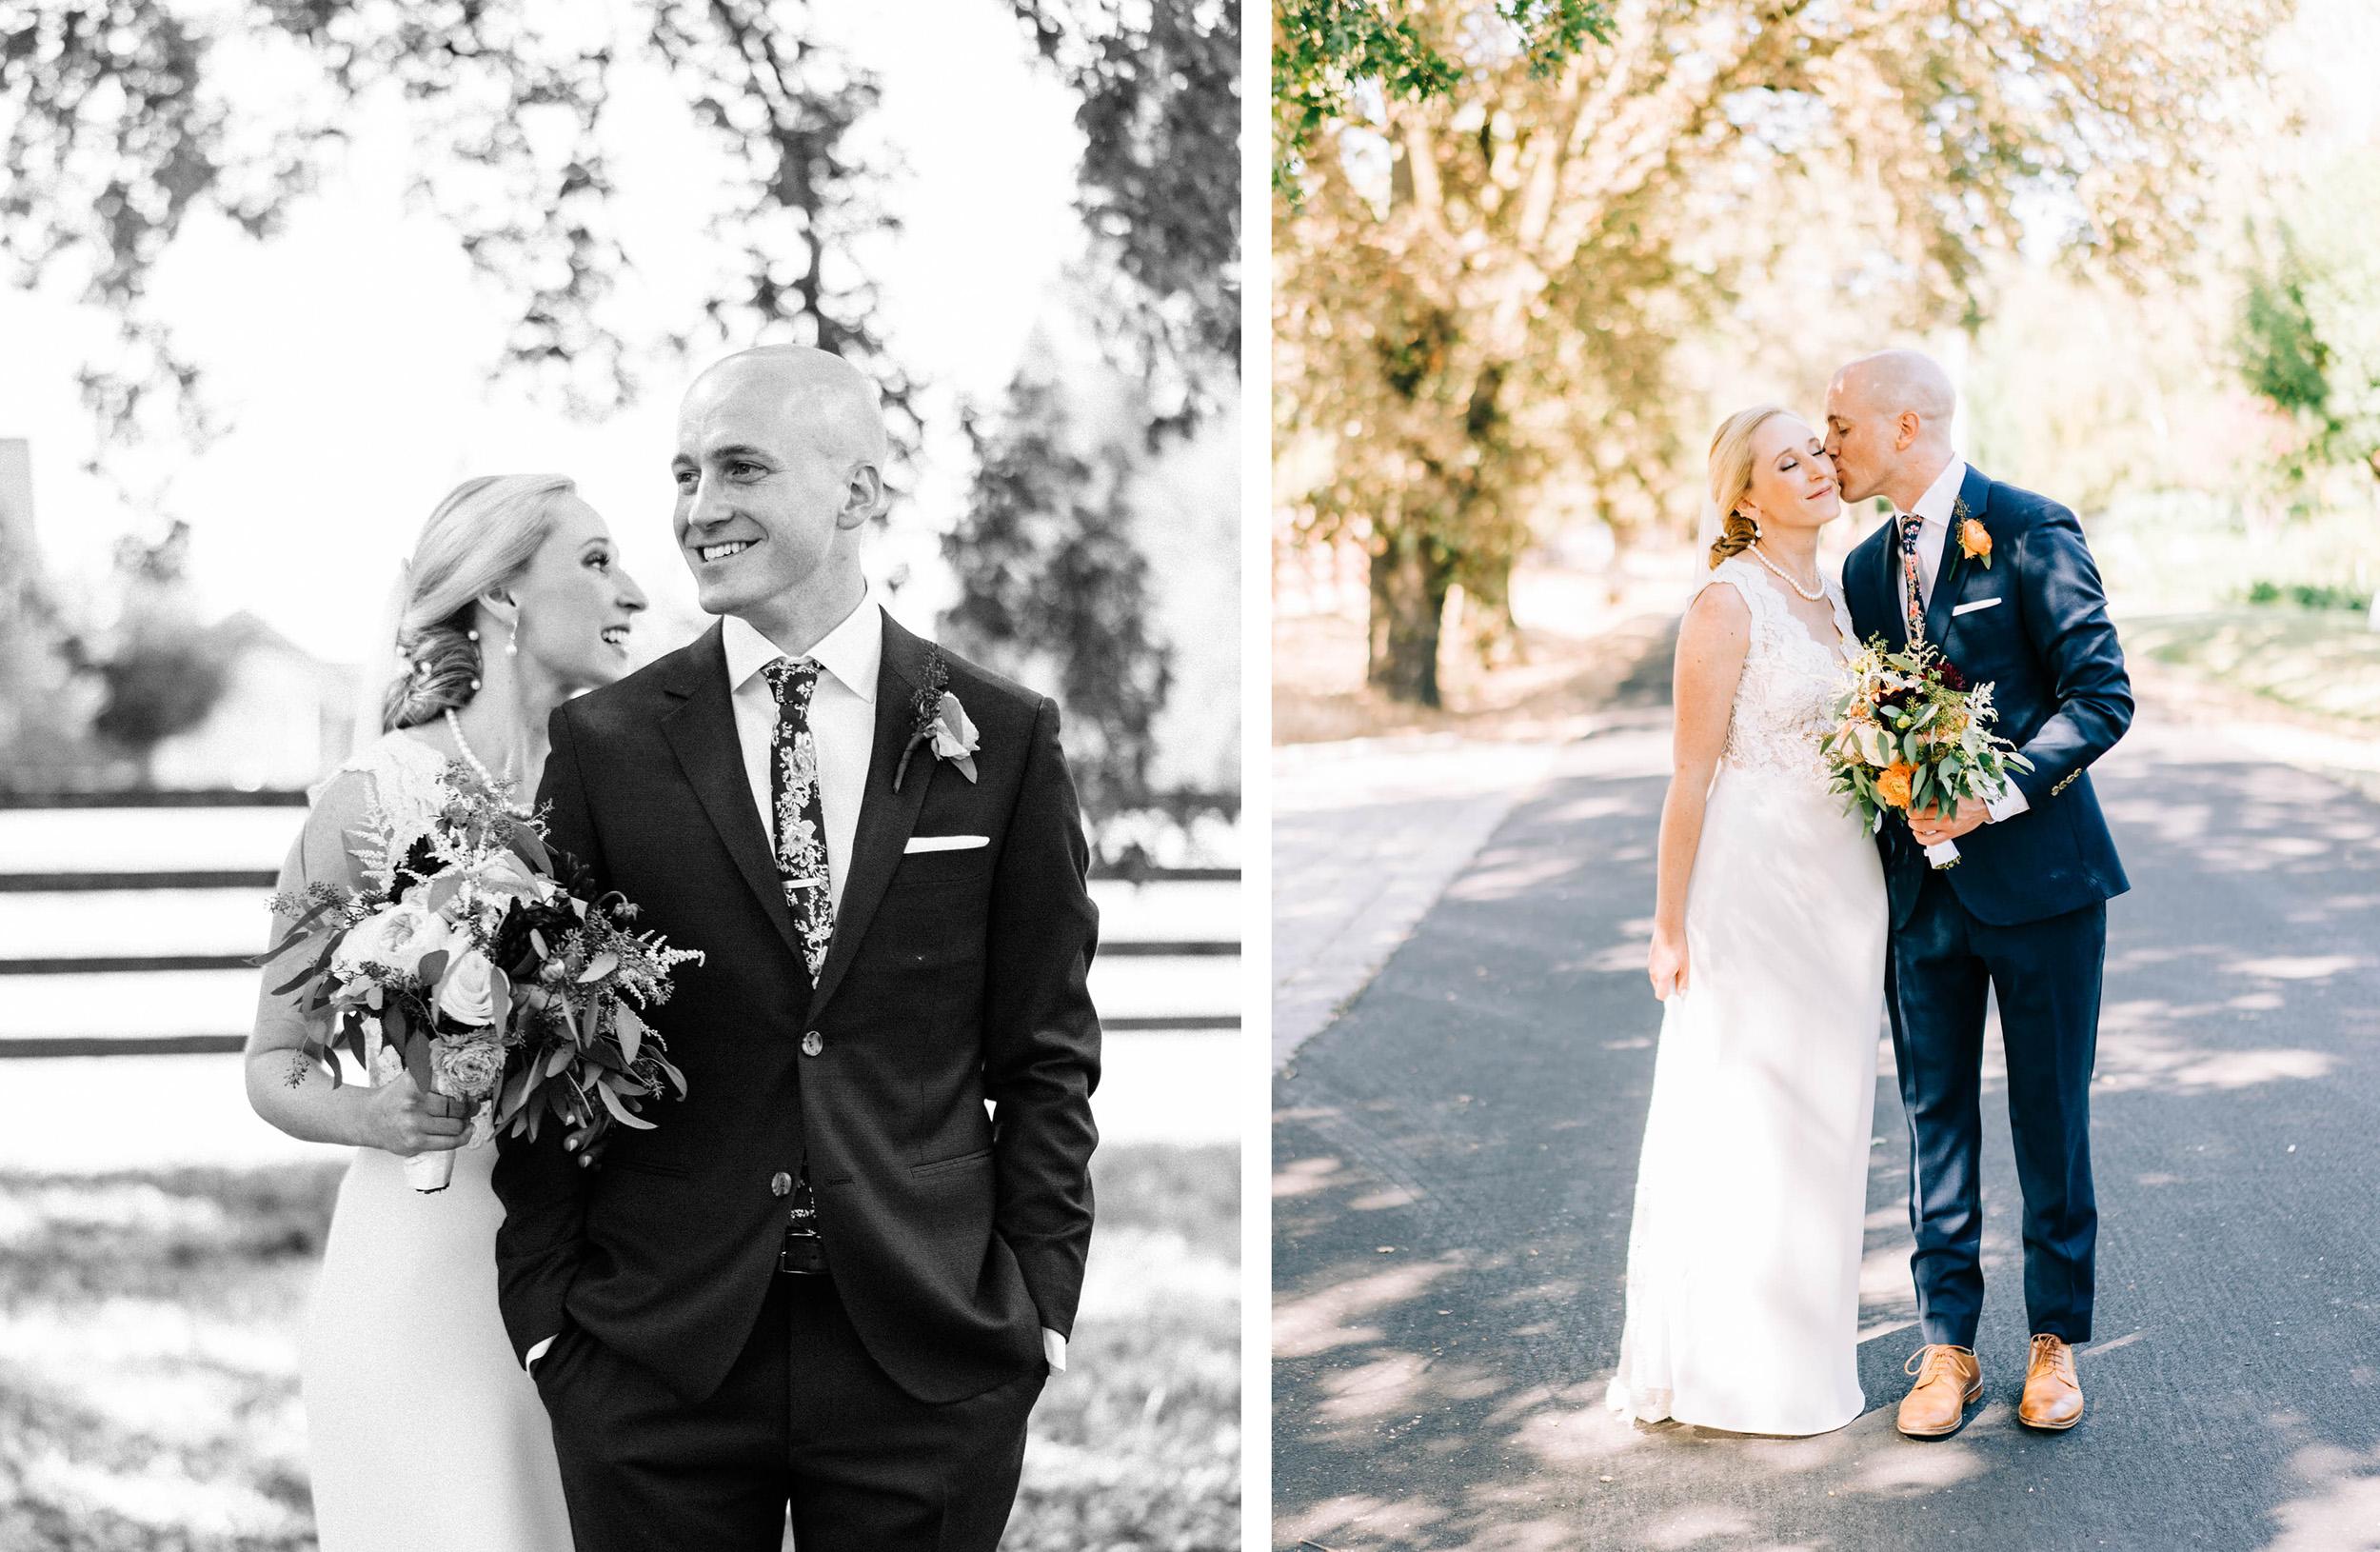 Elk Grove White Arbor Wedding Photographer -14.jpg